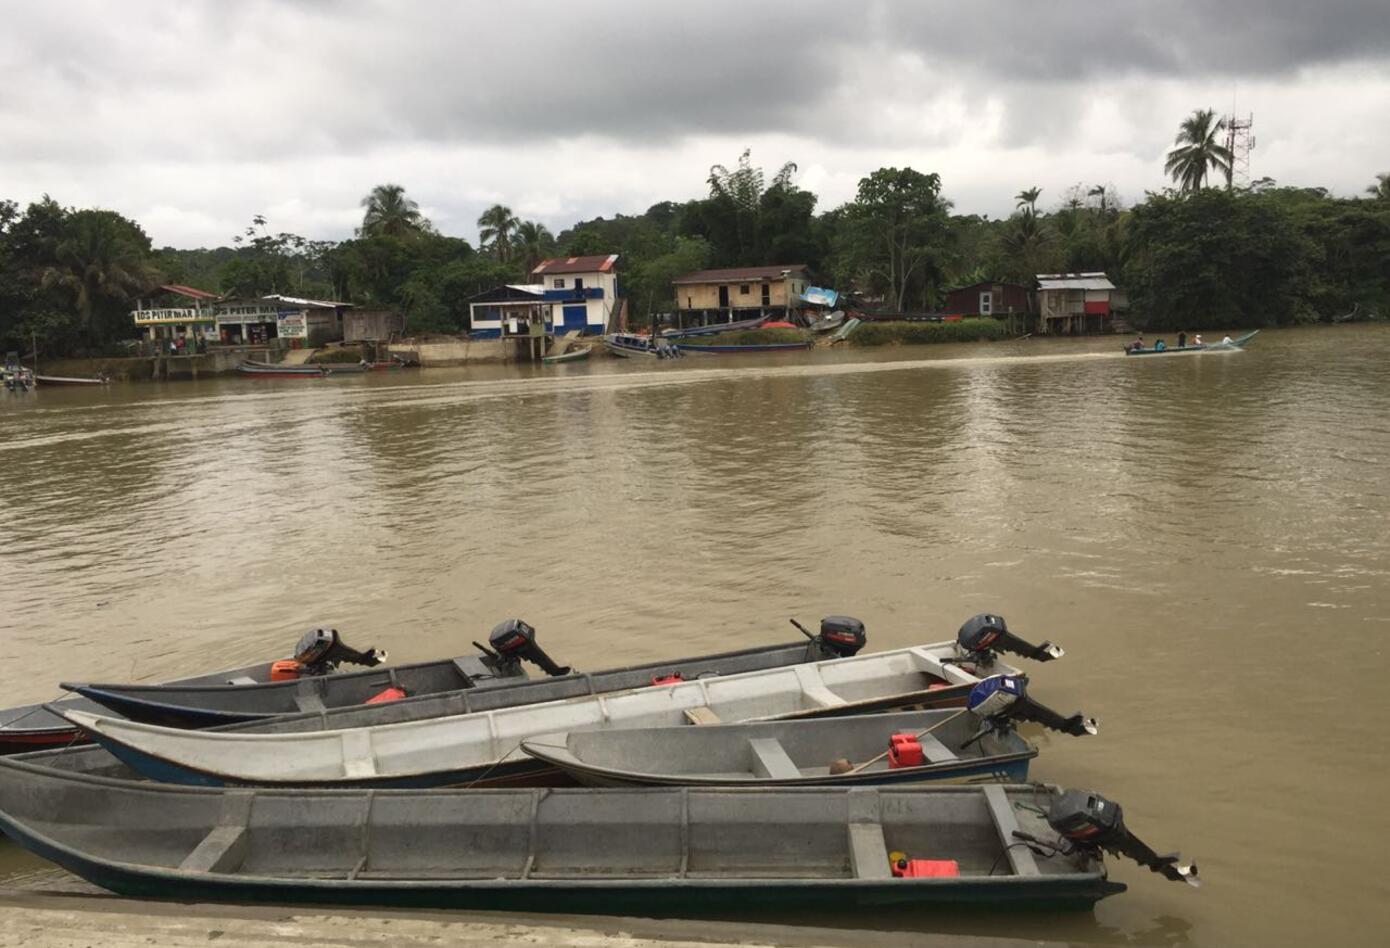 Río Timbiquí (Cauca)